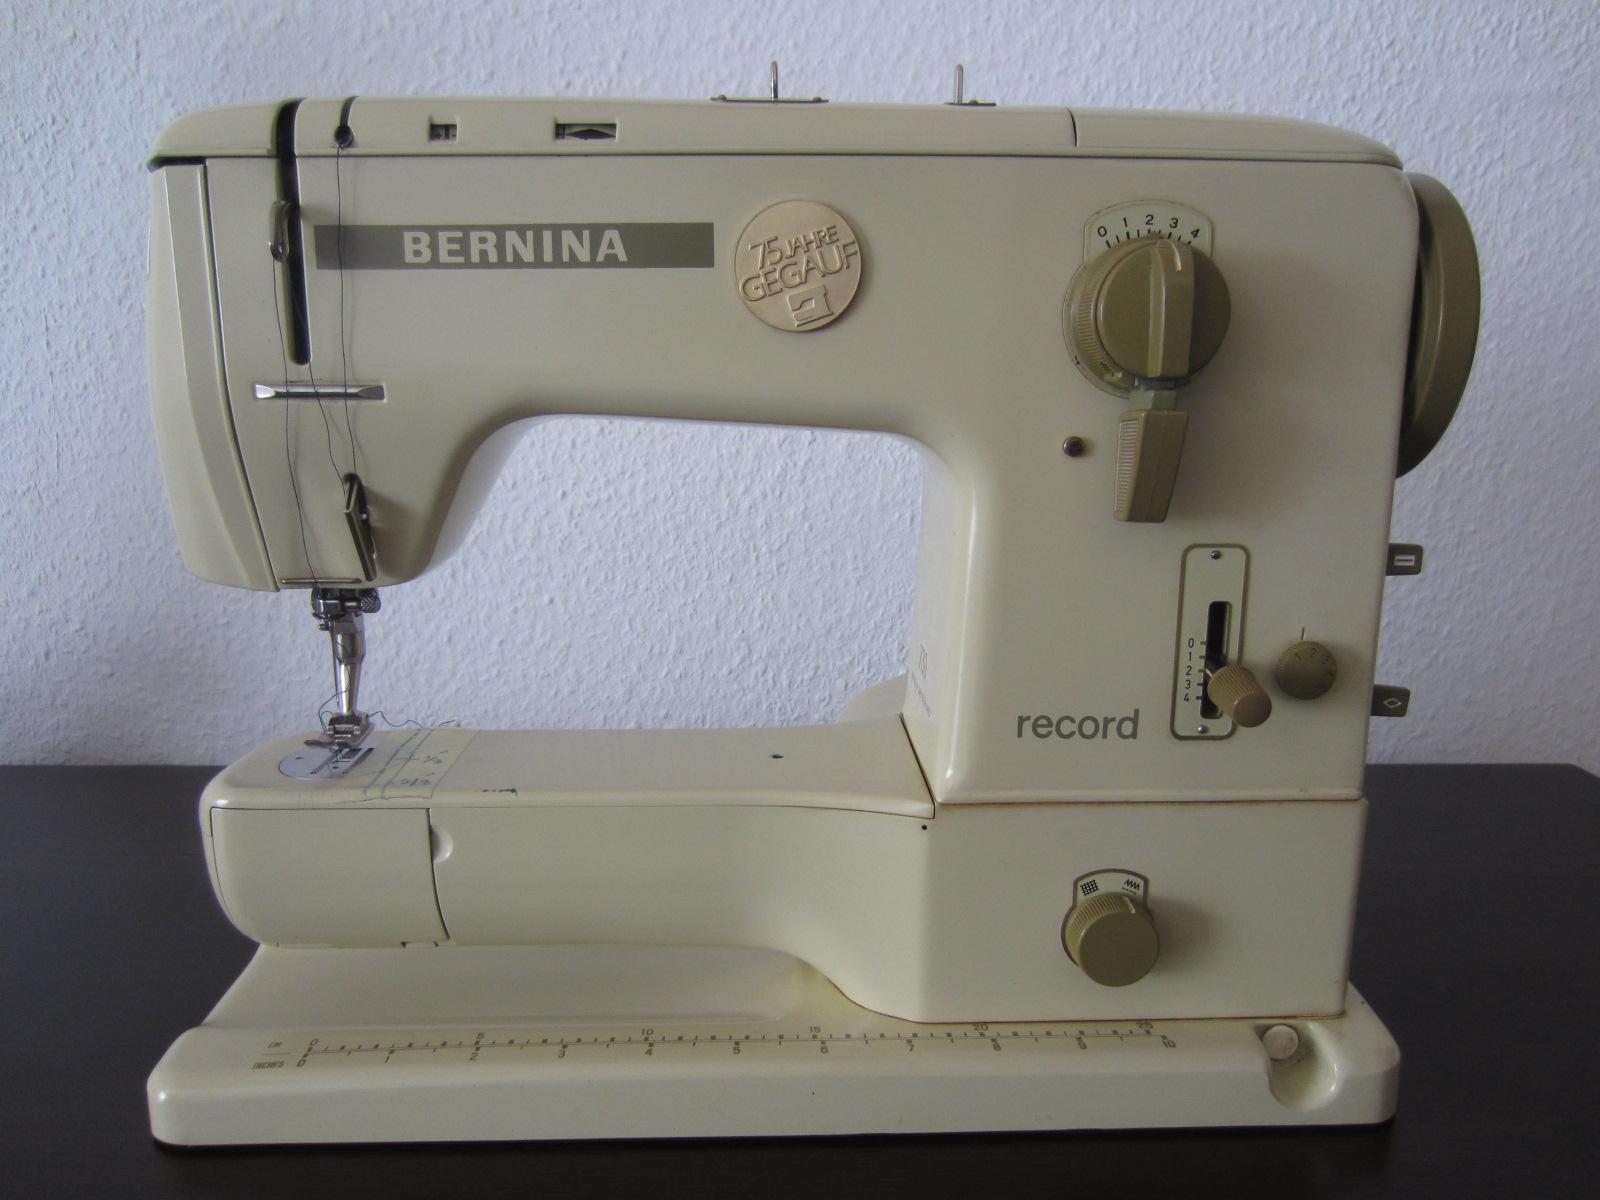 retro tech geneva sewing machine sundays bernina record jpg 1600x1200 used bernina sewing machines sale [ 1600 x 1200 Pixel ]